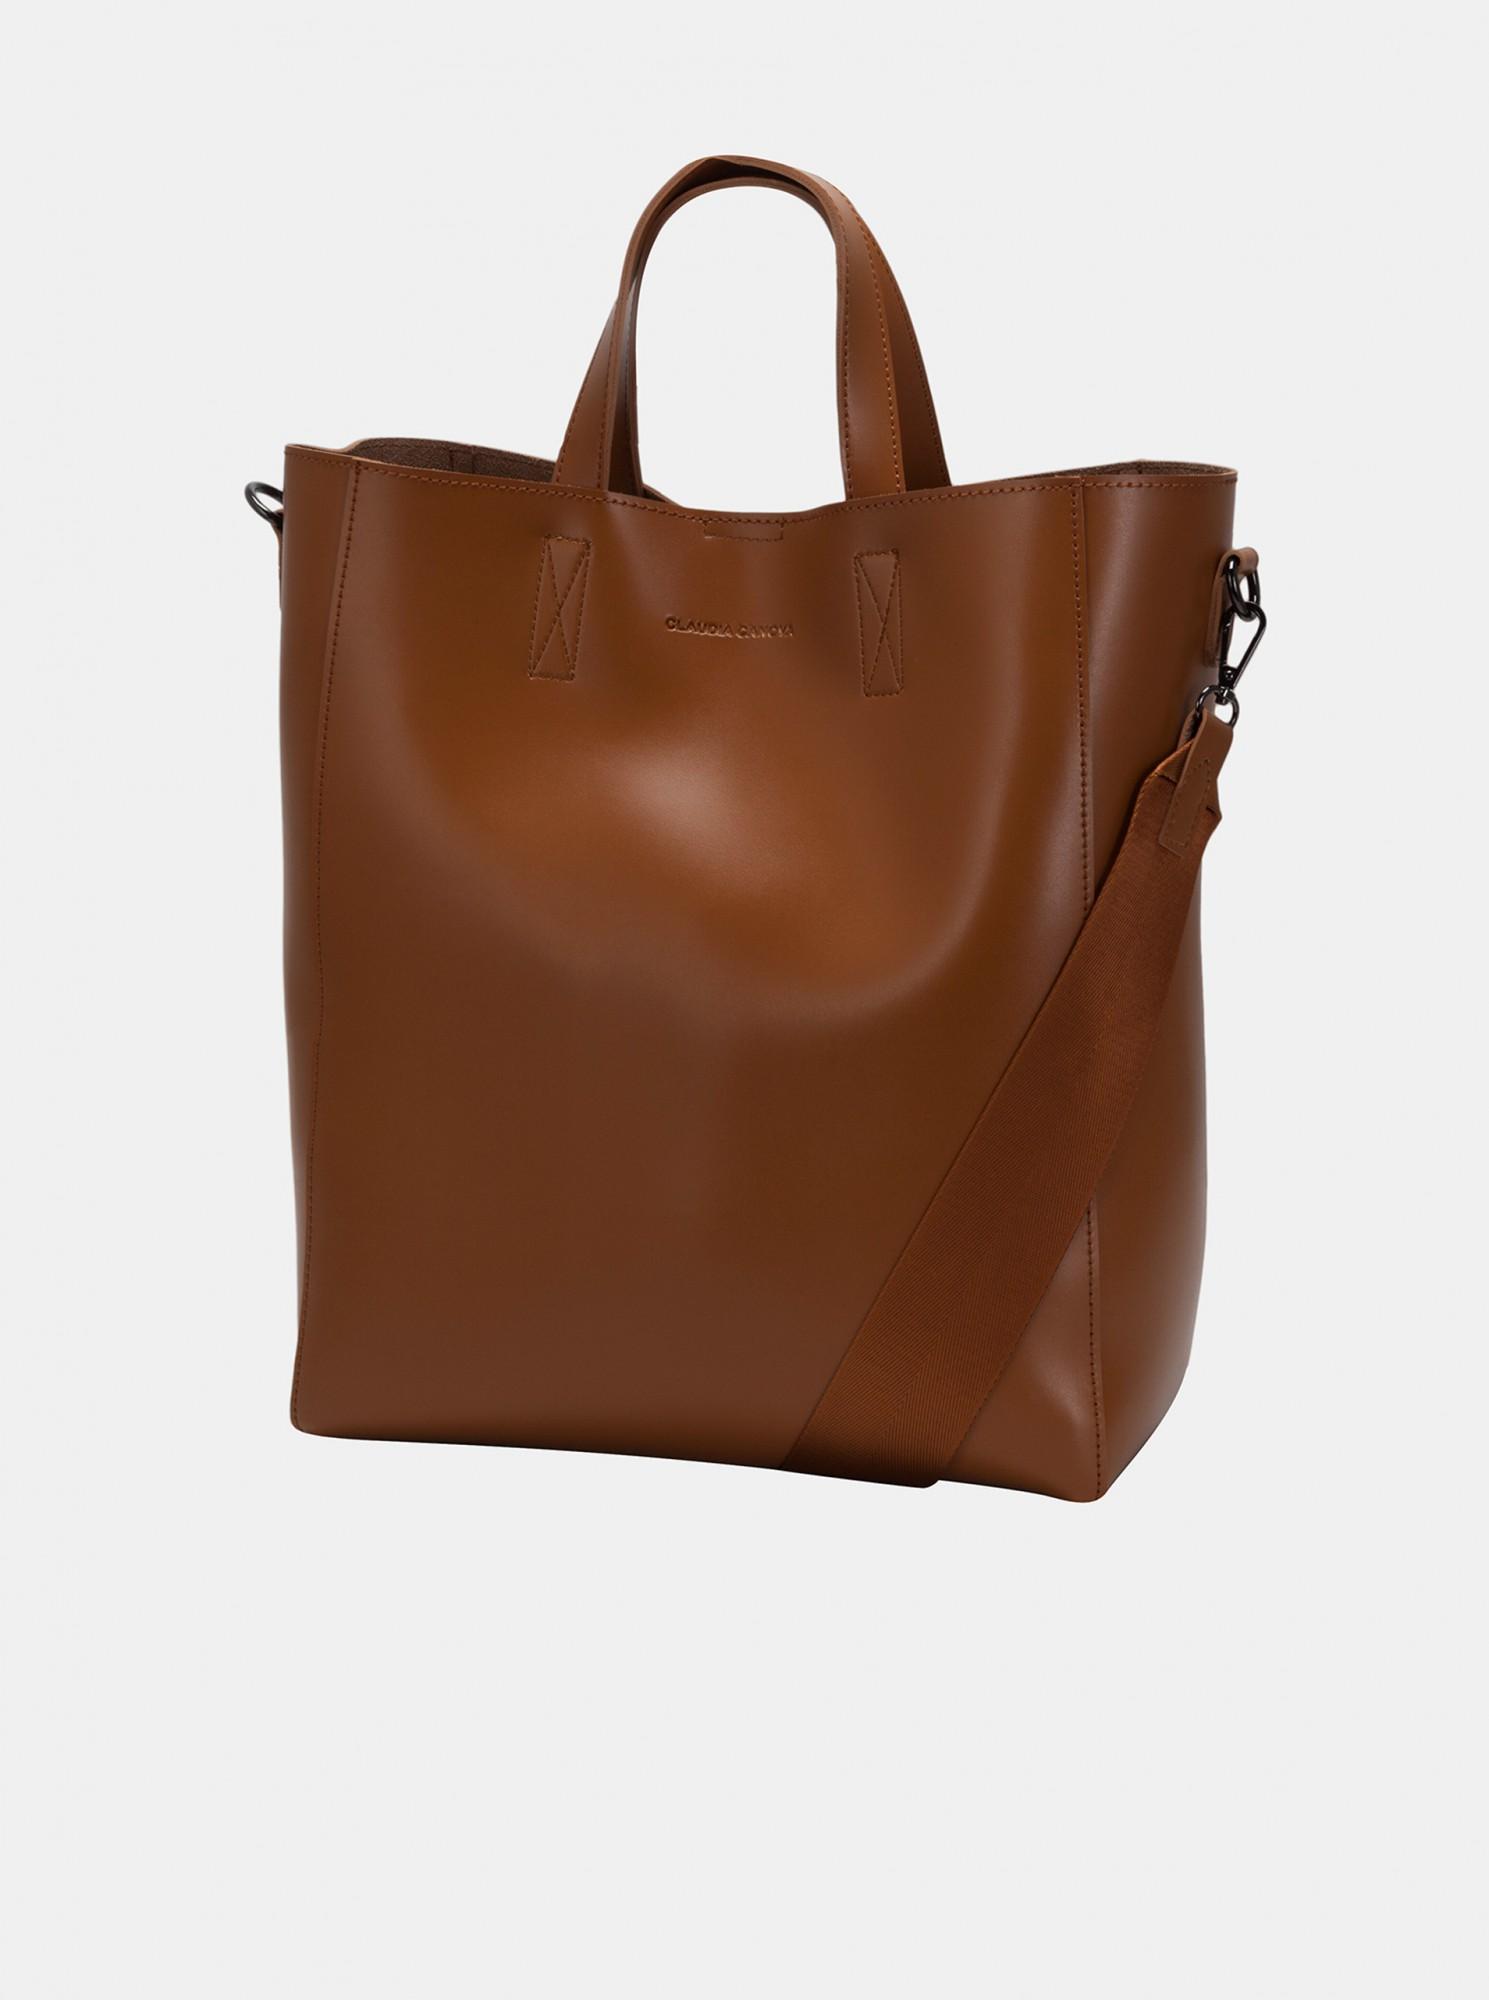 Claudia Canova brown large handbag